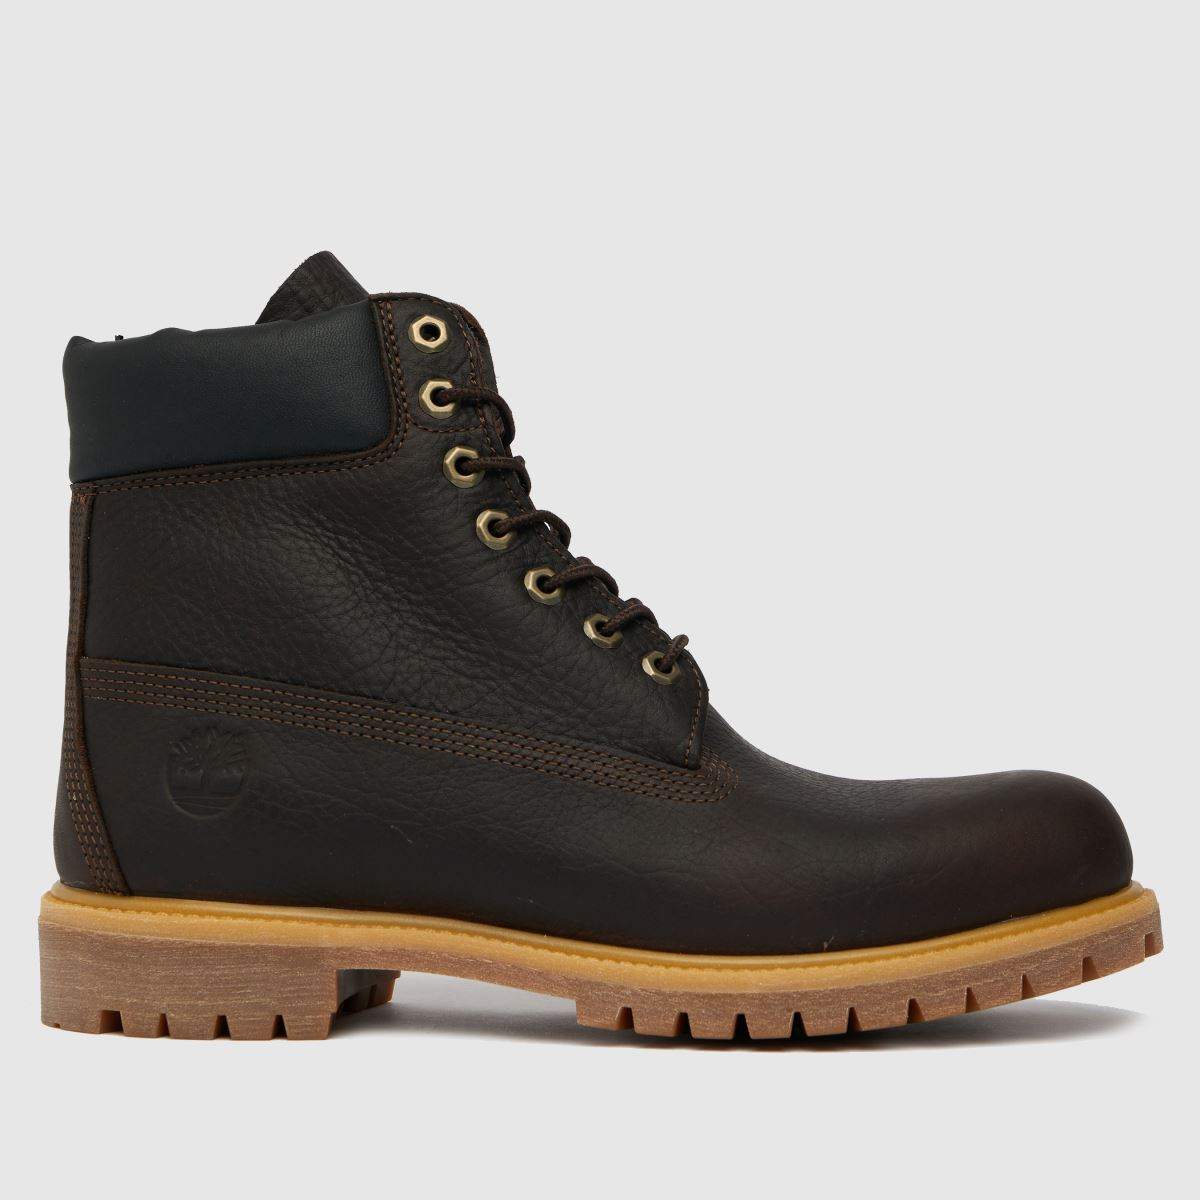 Timberland Dark Brown Timb 6 In Premium Boots